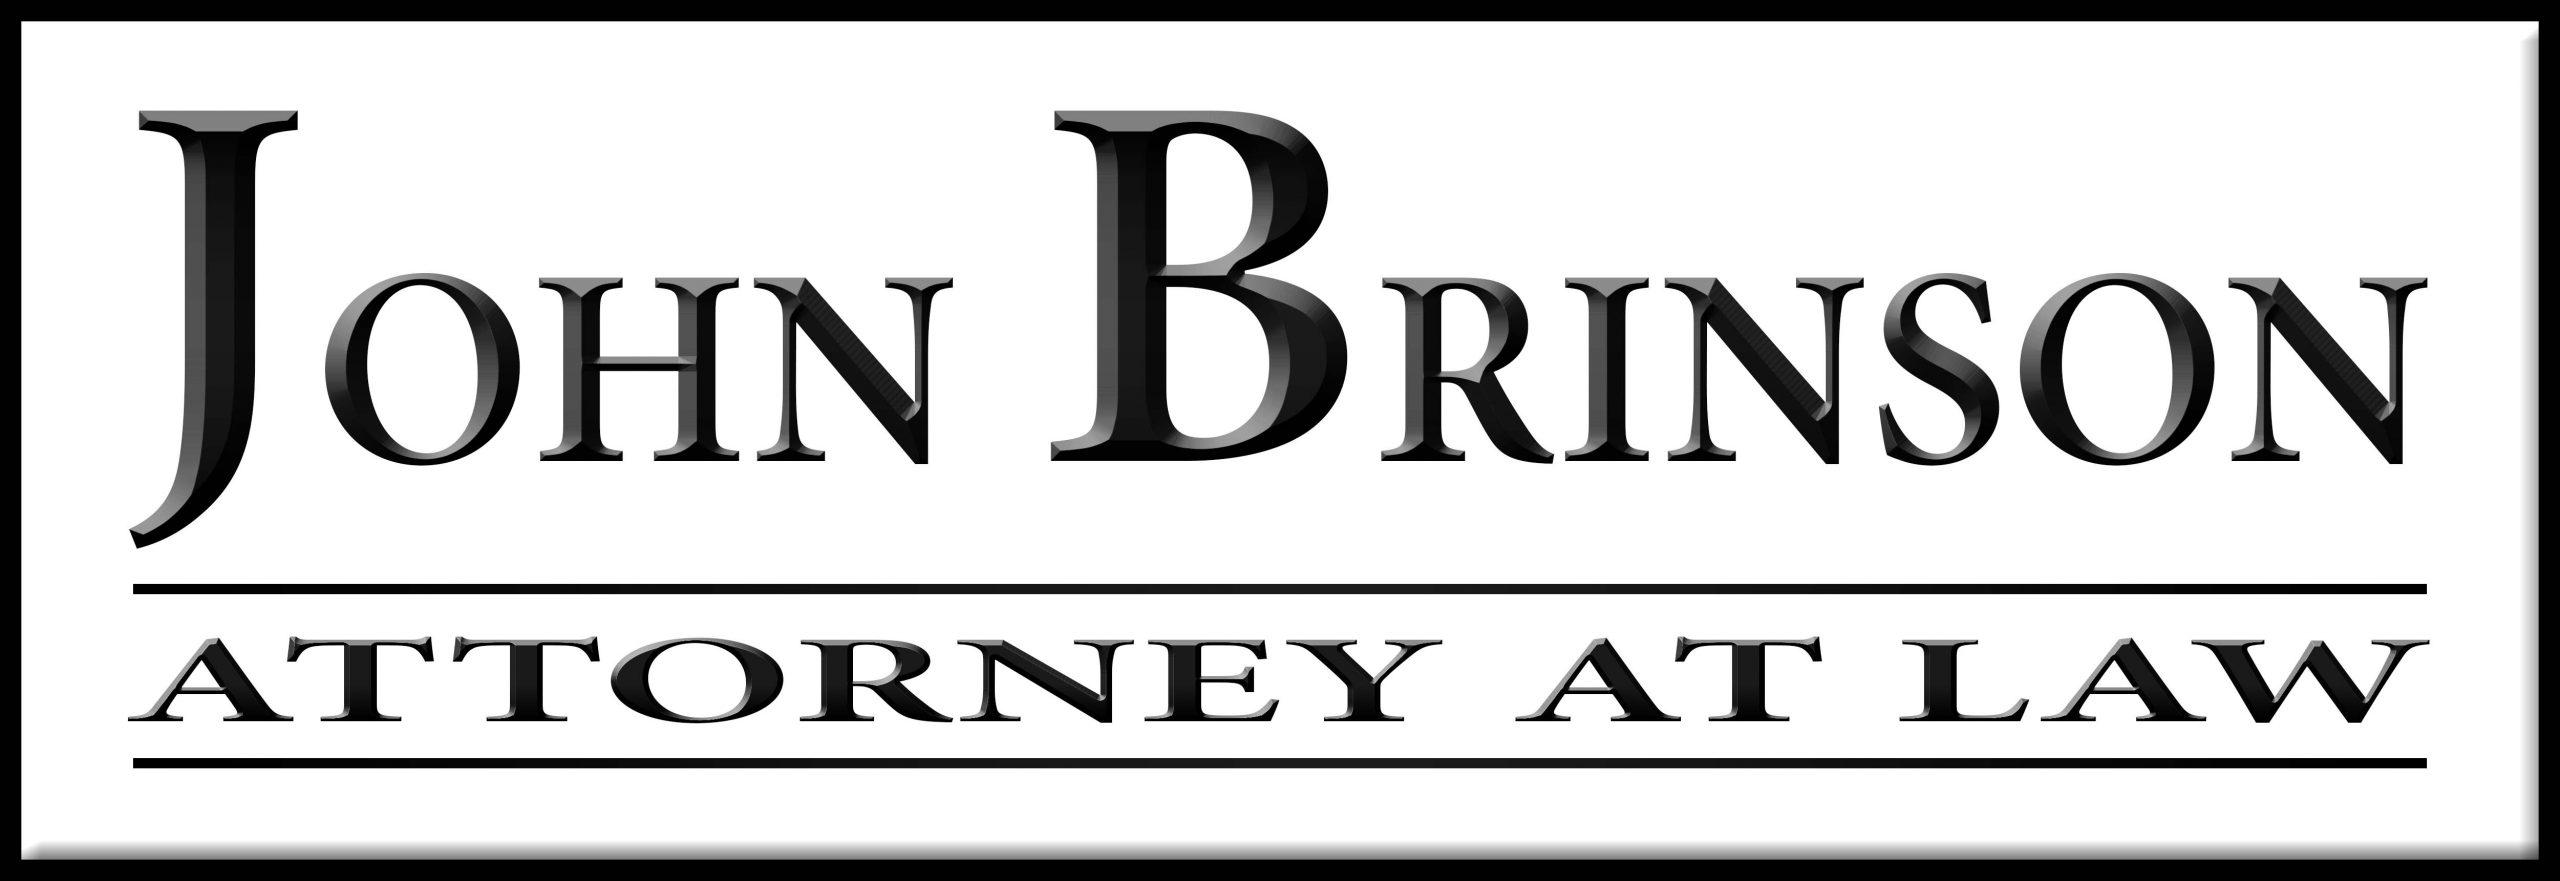 John Brinson